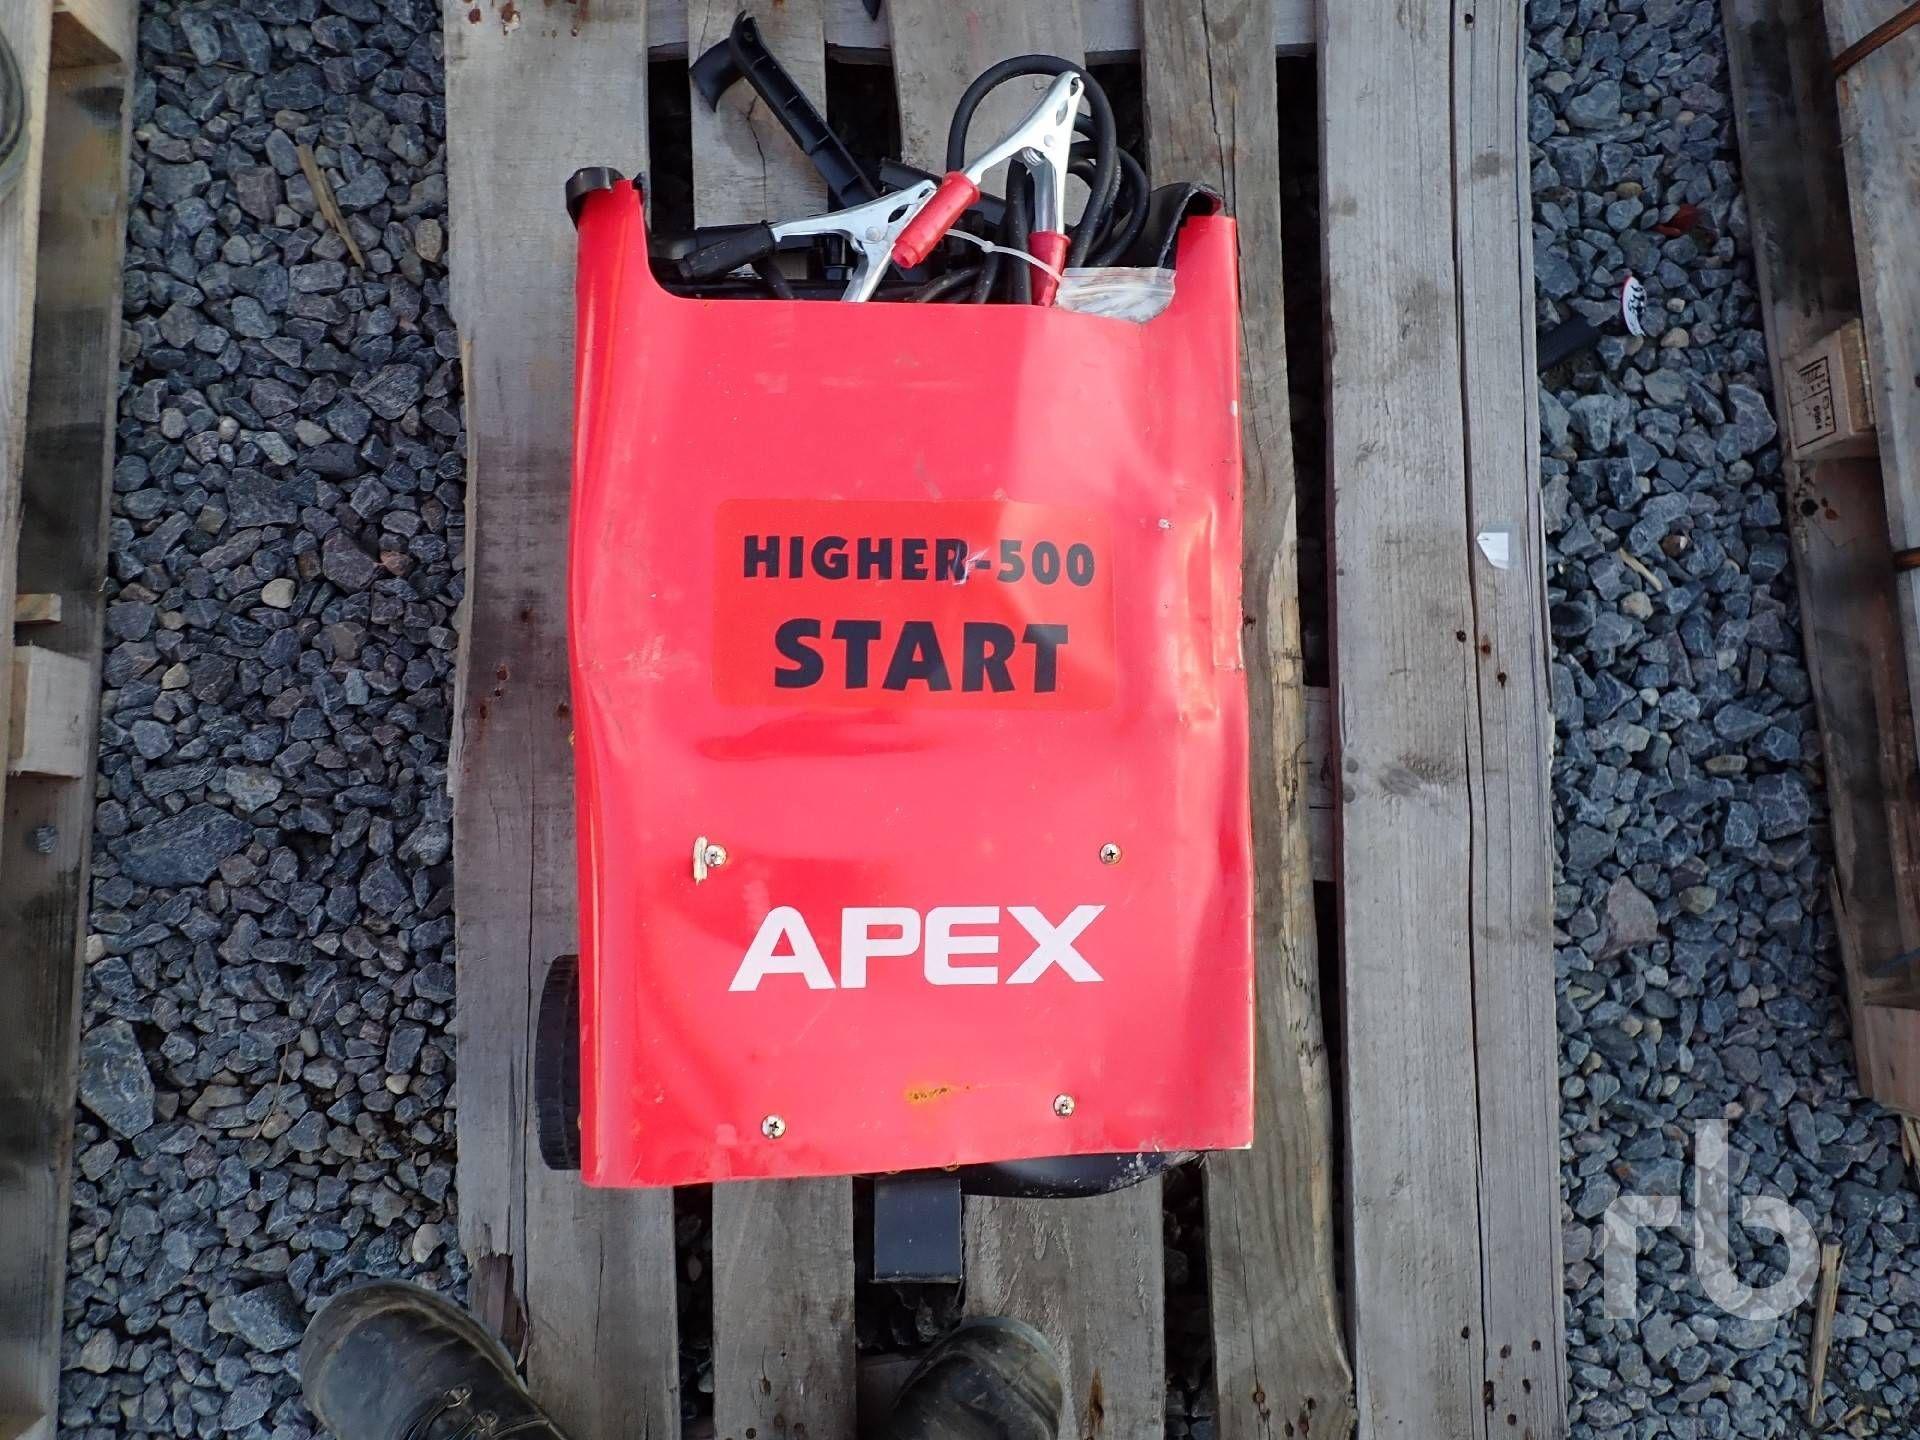 2019 APEX HIGHER-500 Ladegerät